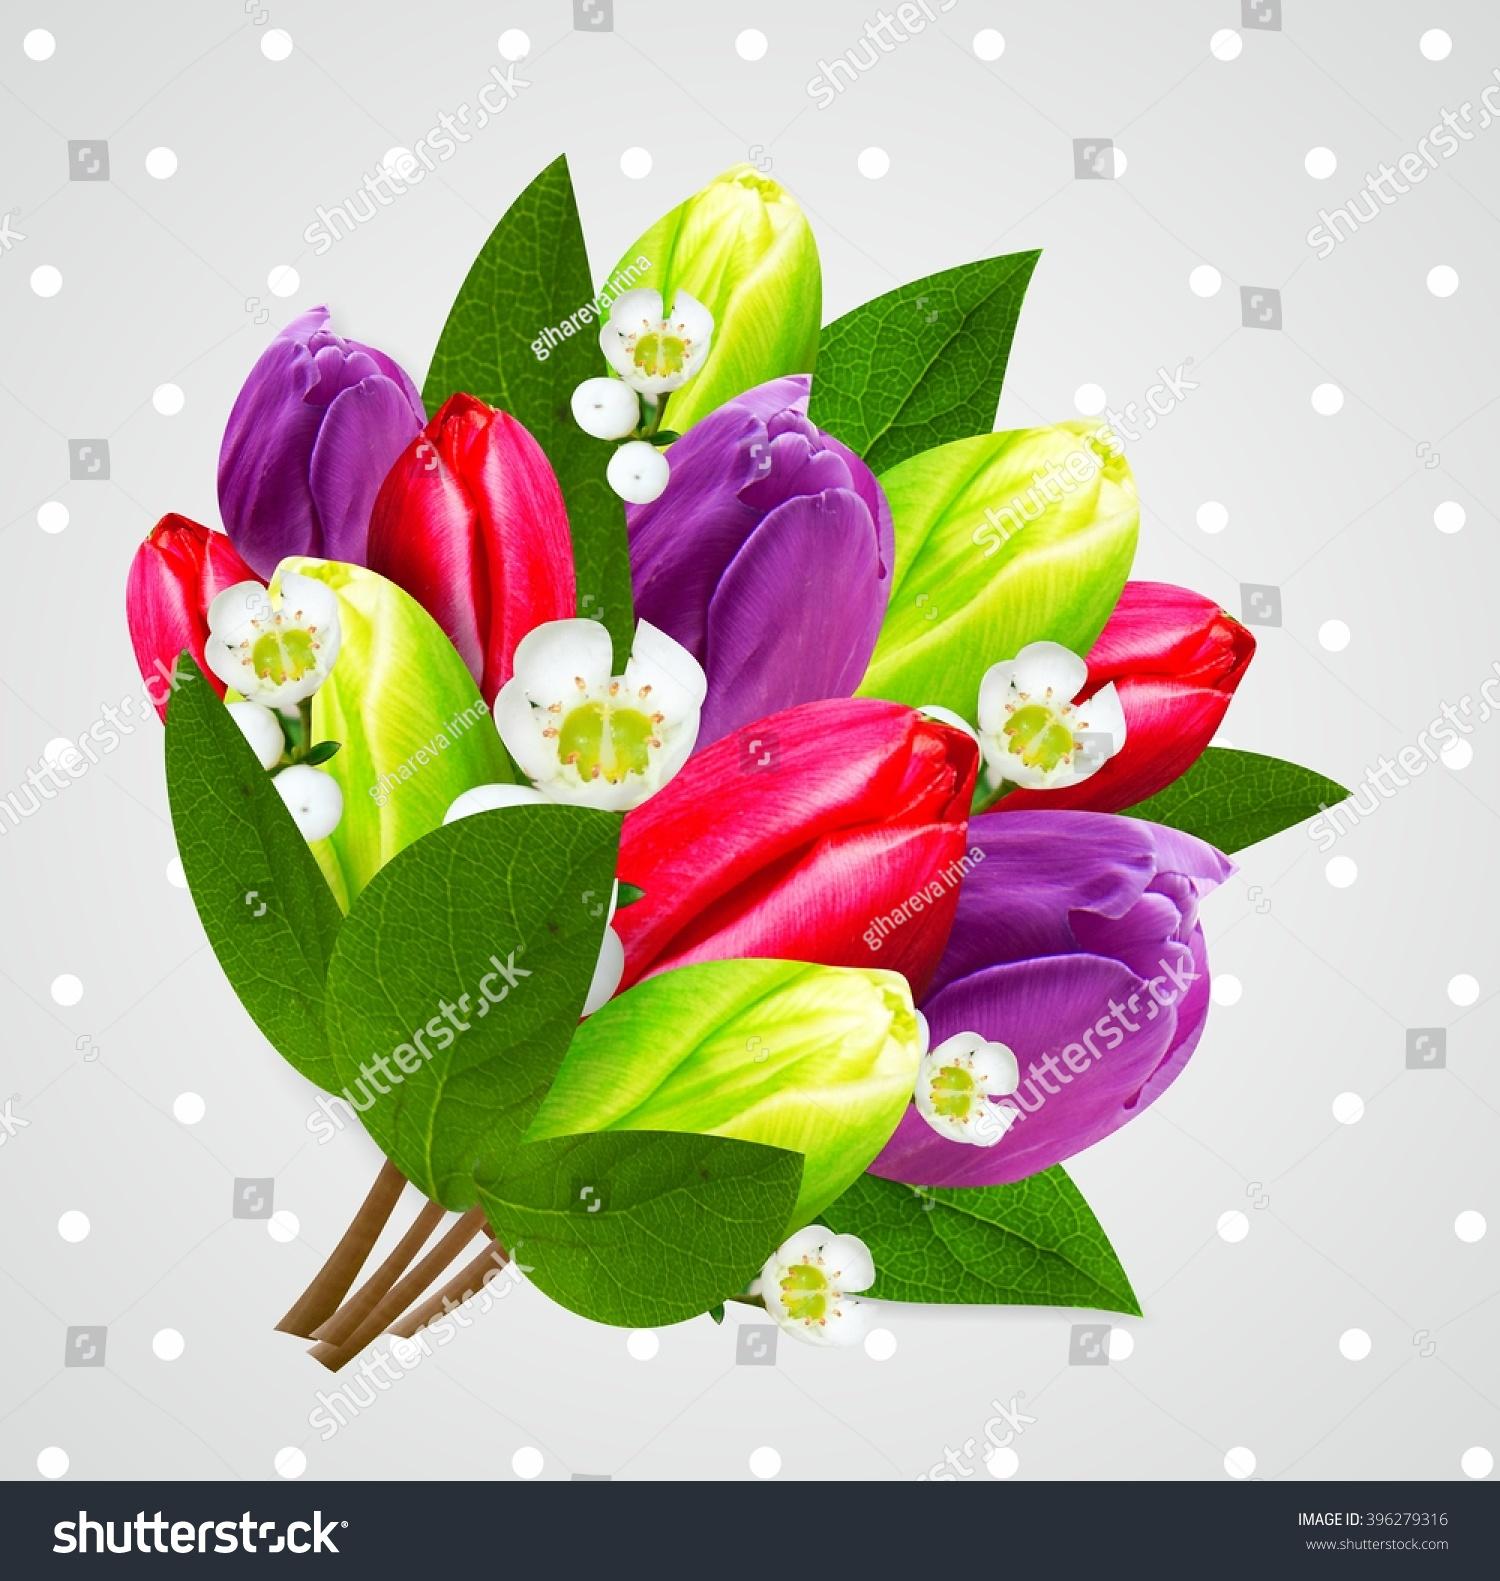 Very beautiful flowers composition bouquet stock illustration very beautiful flowers composition bouquet izmirmasajfo